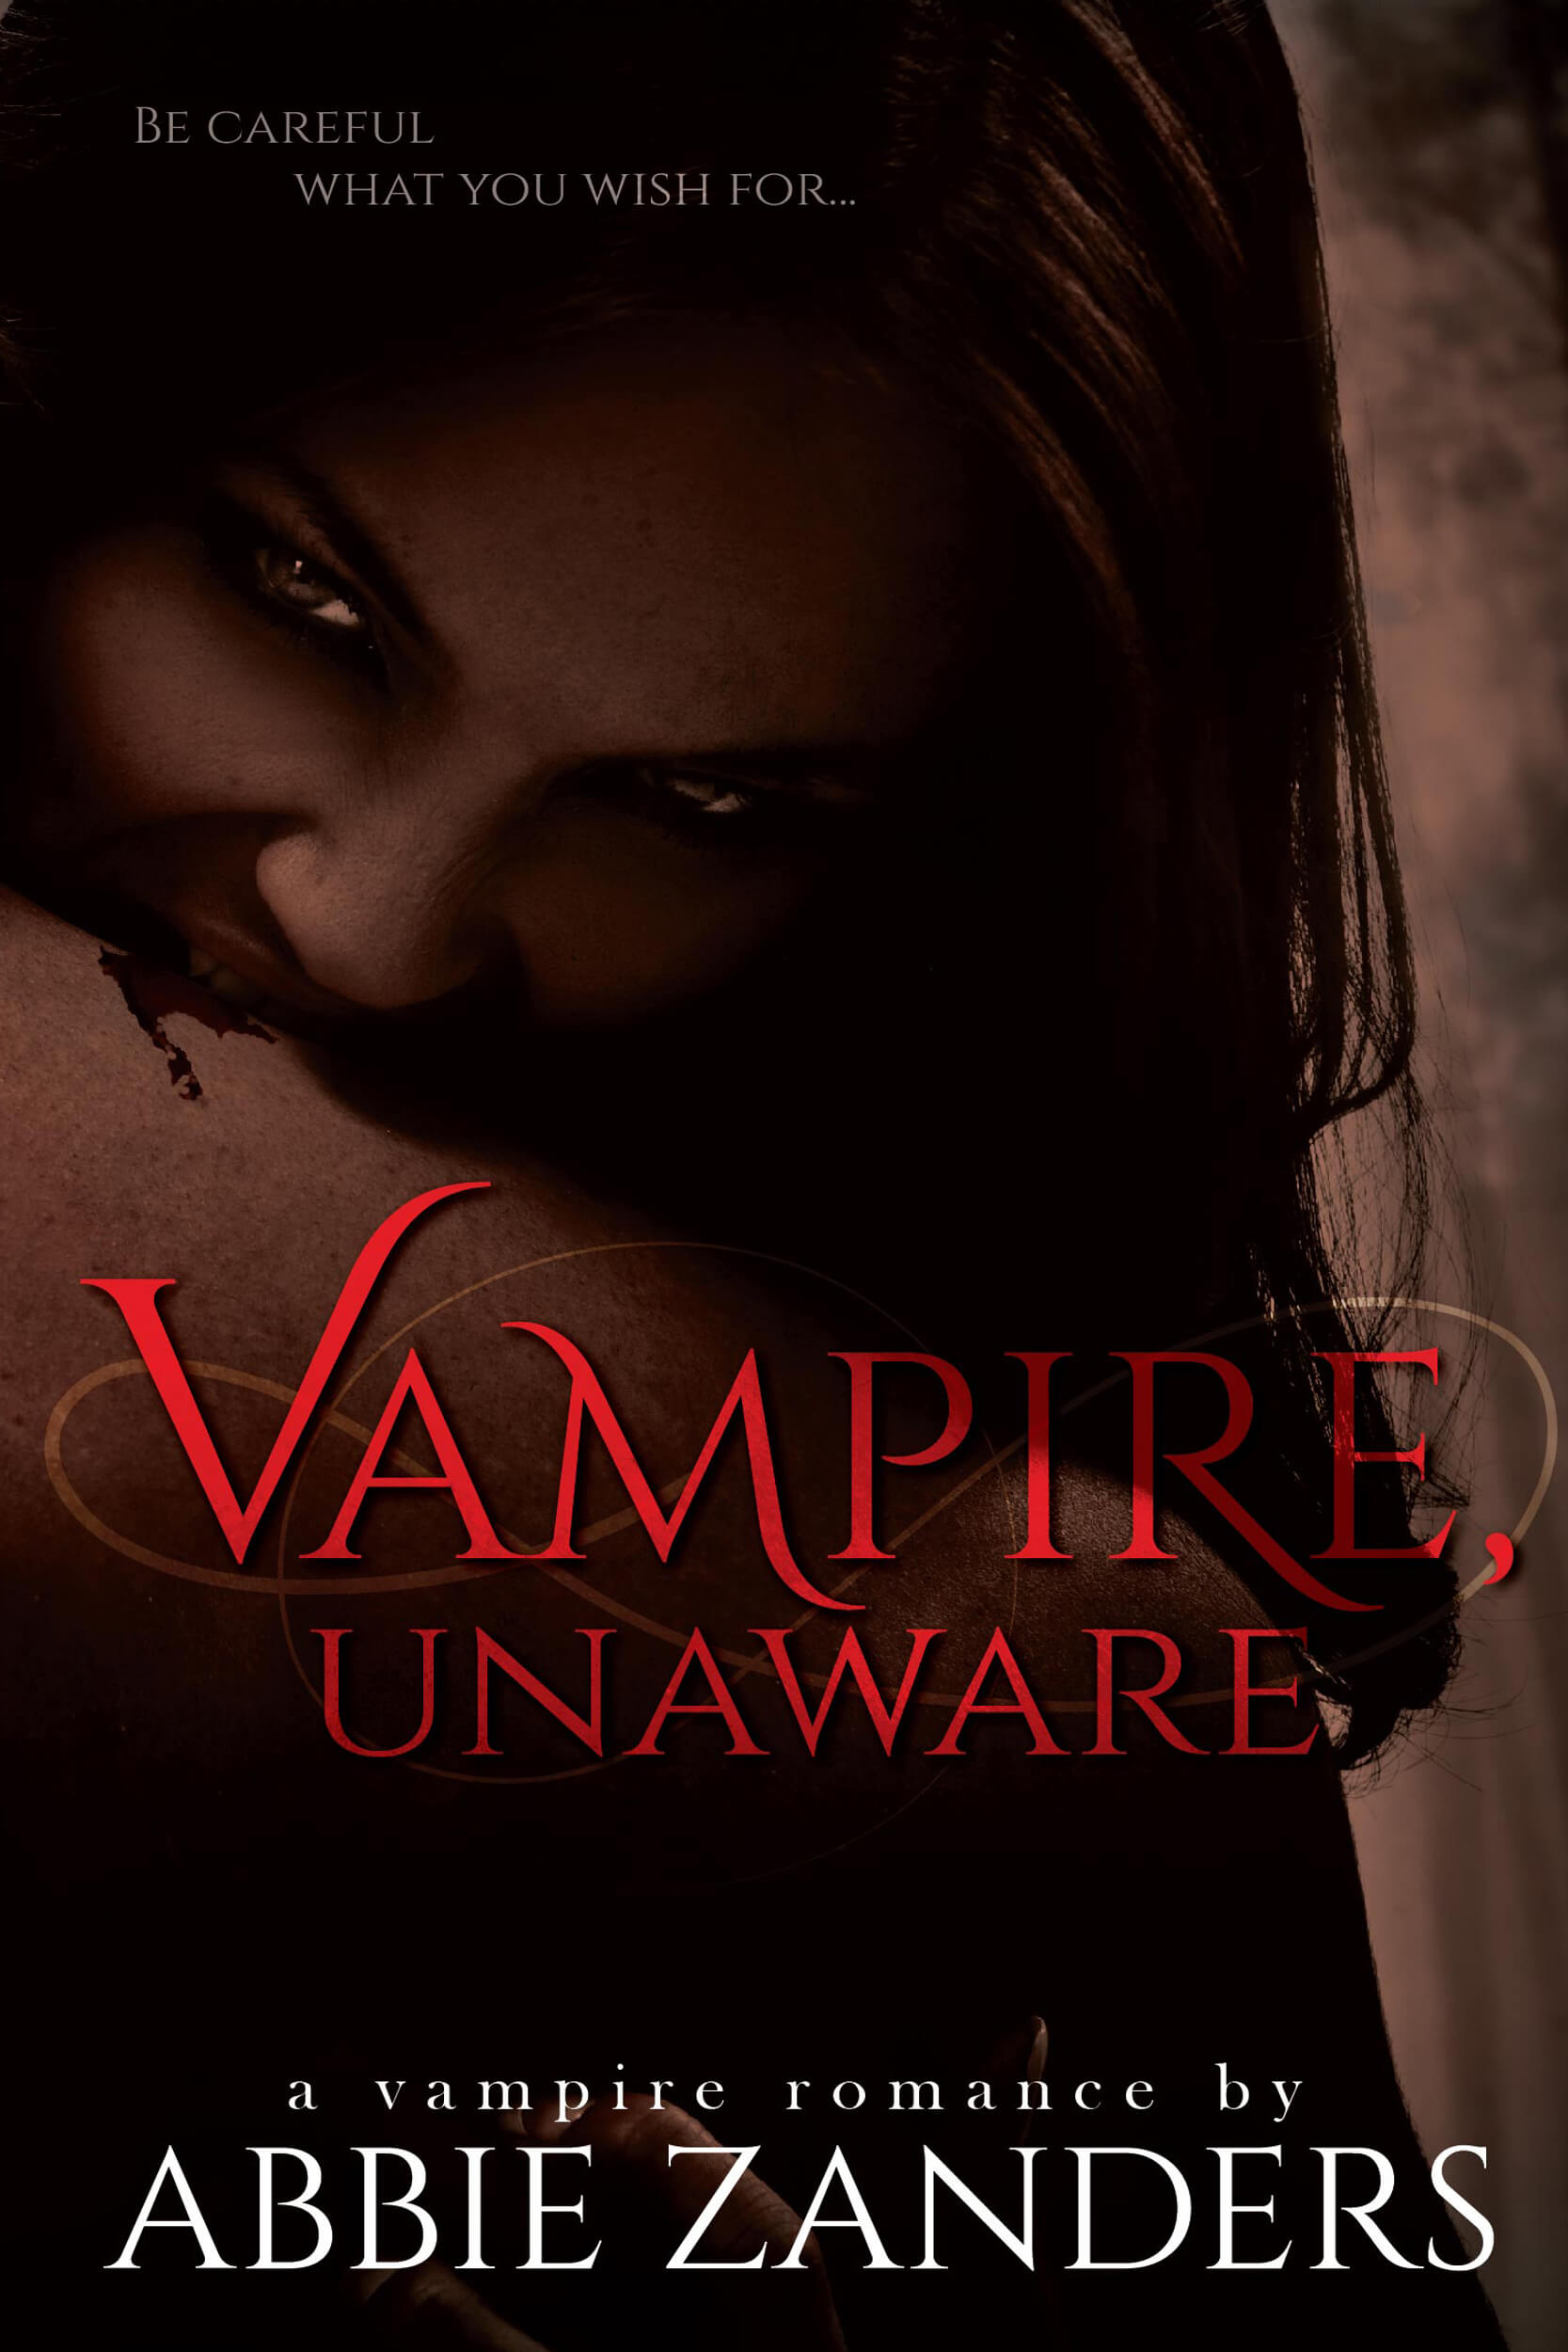 Vampire Unaware